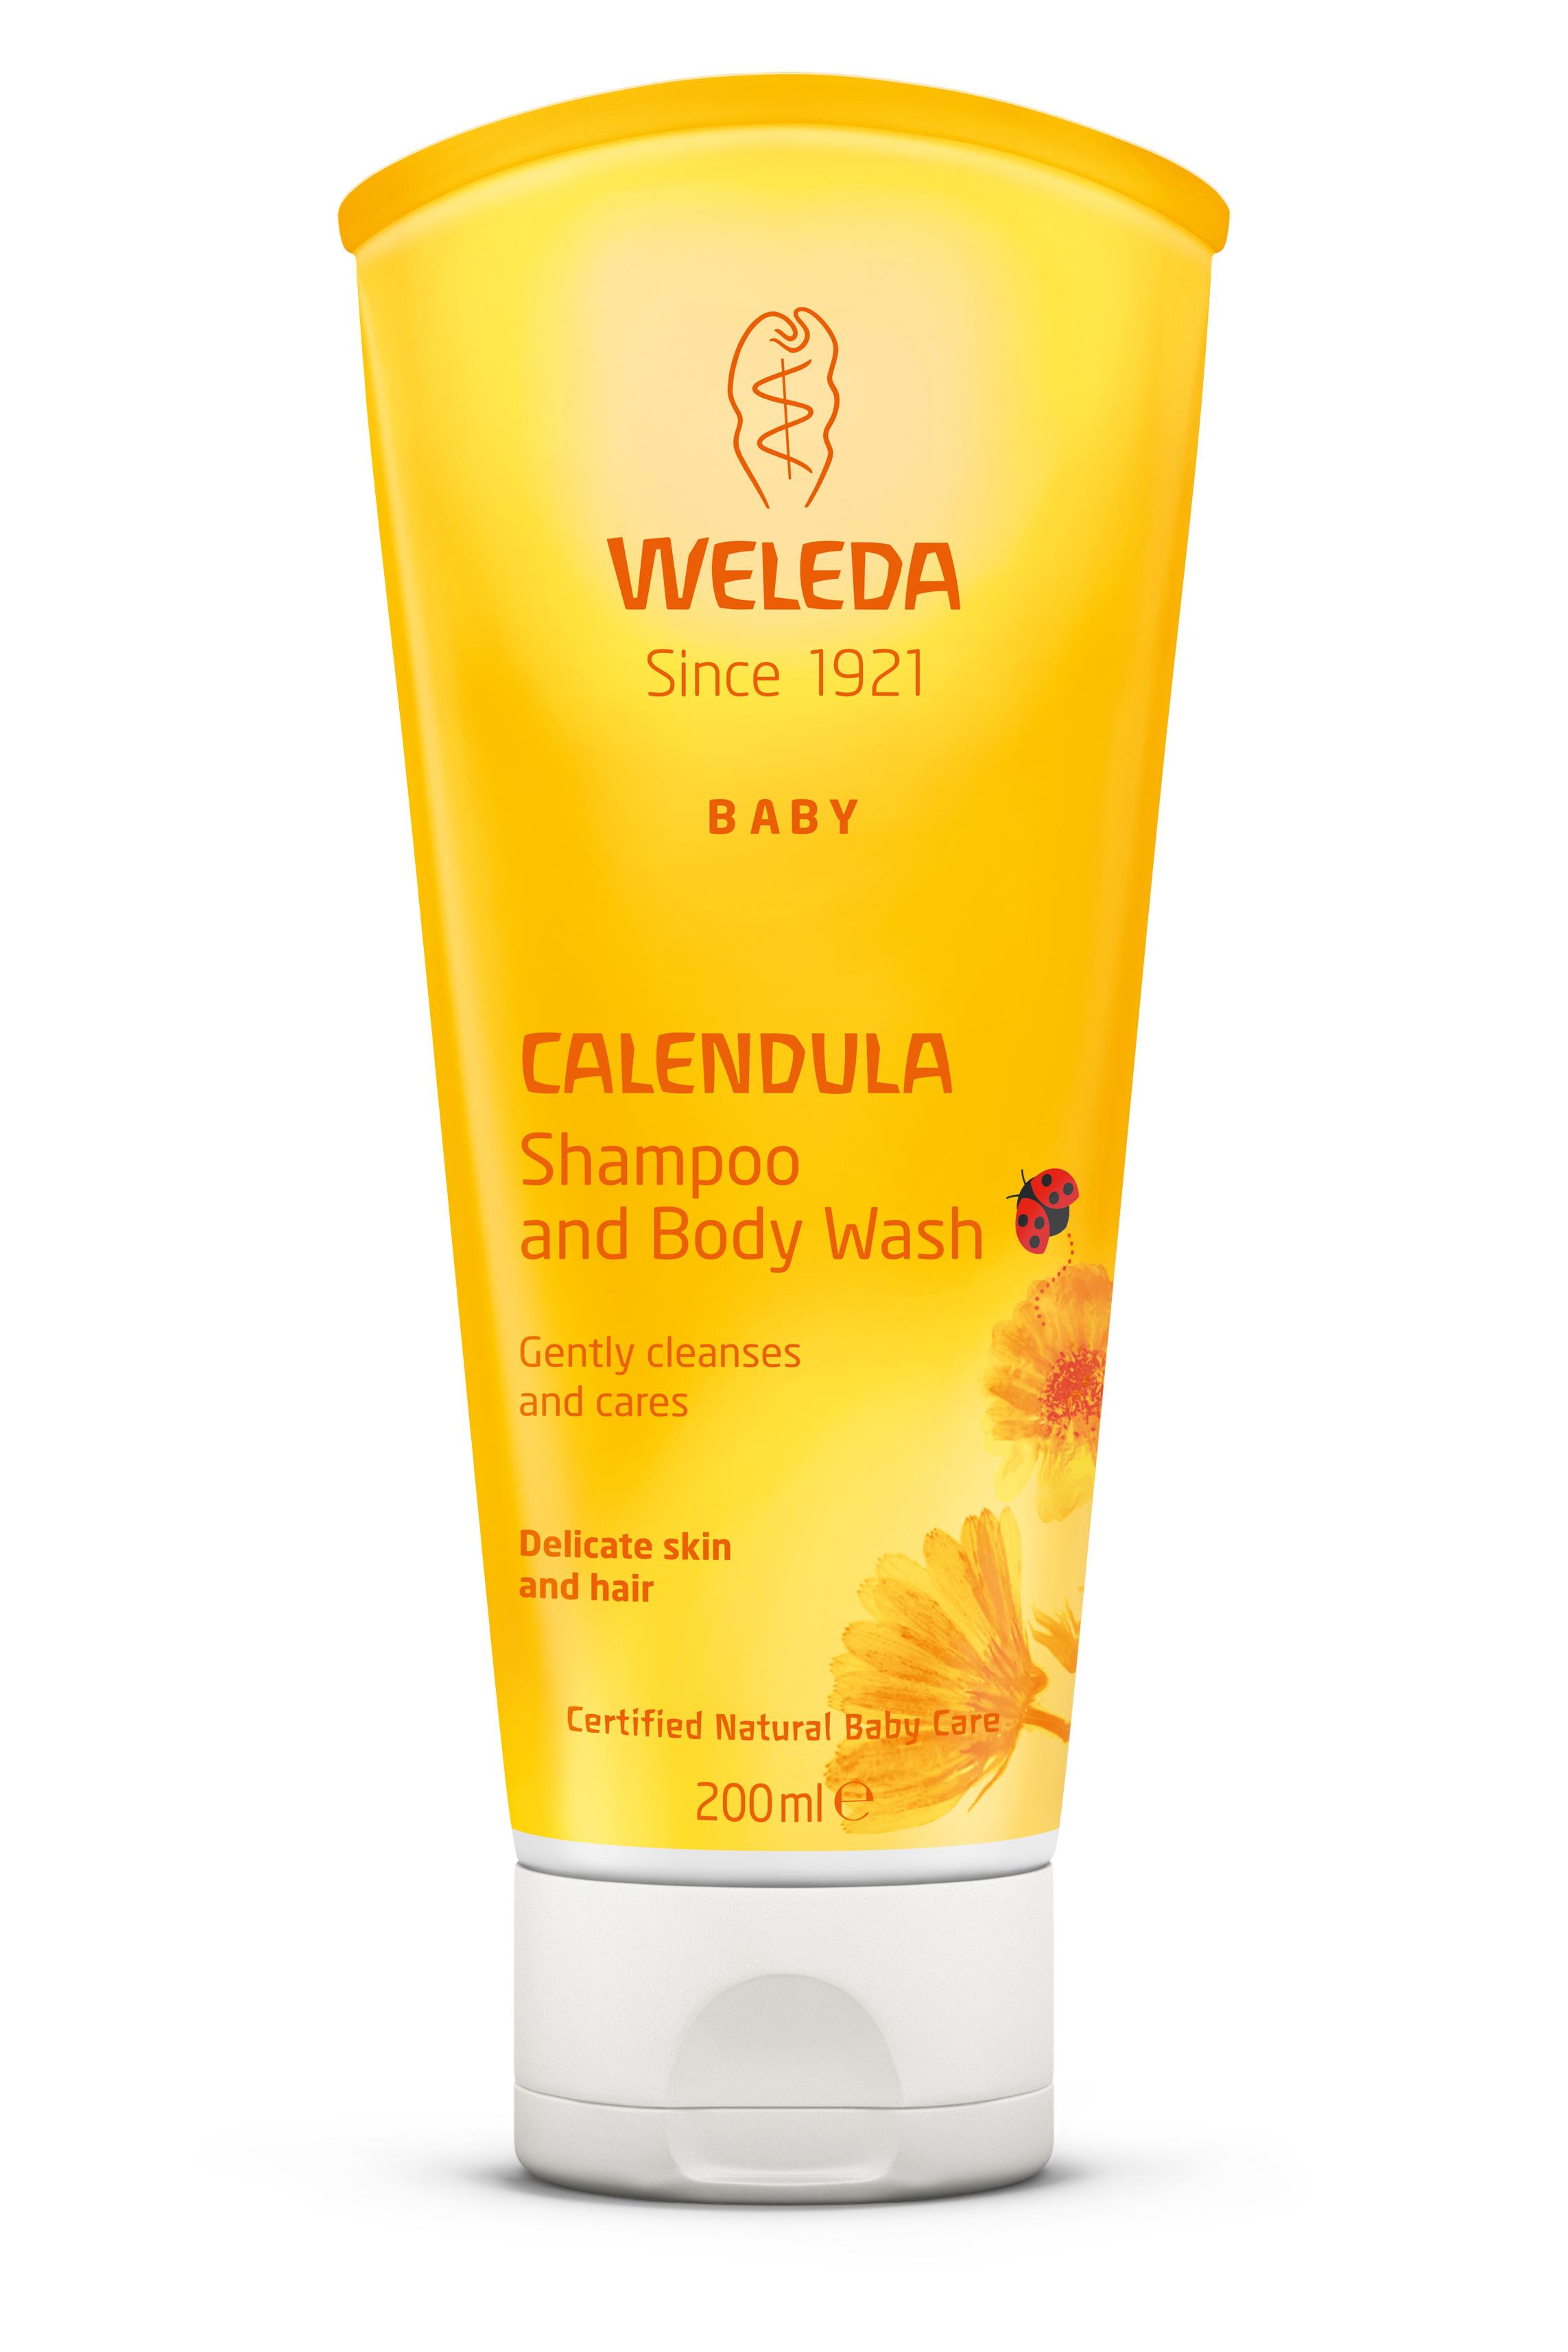 WELEDA CALENDULA SHAMPOO & BODY WASH www.motherbynature.com shampoo body wash weleda baby shampoo